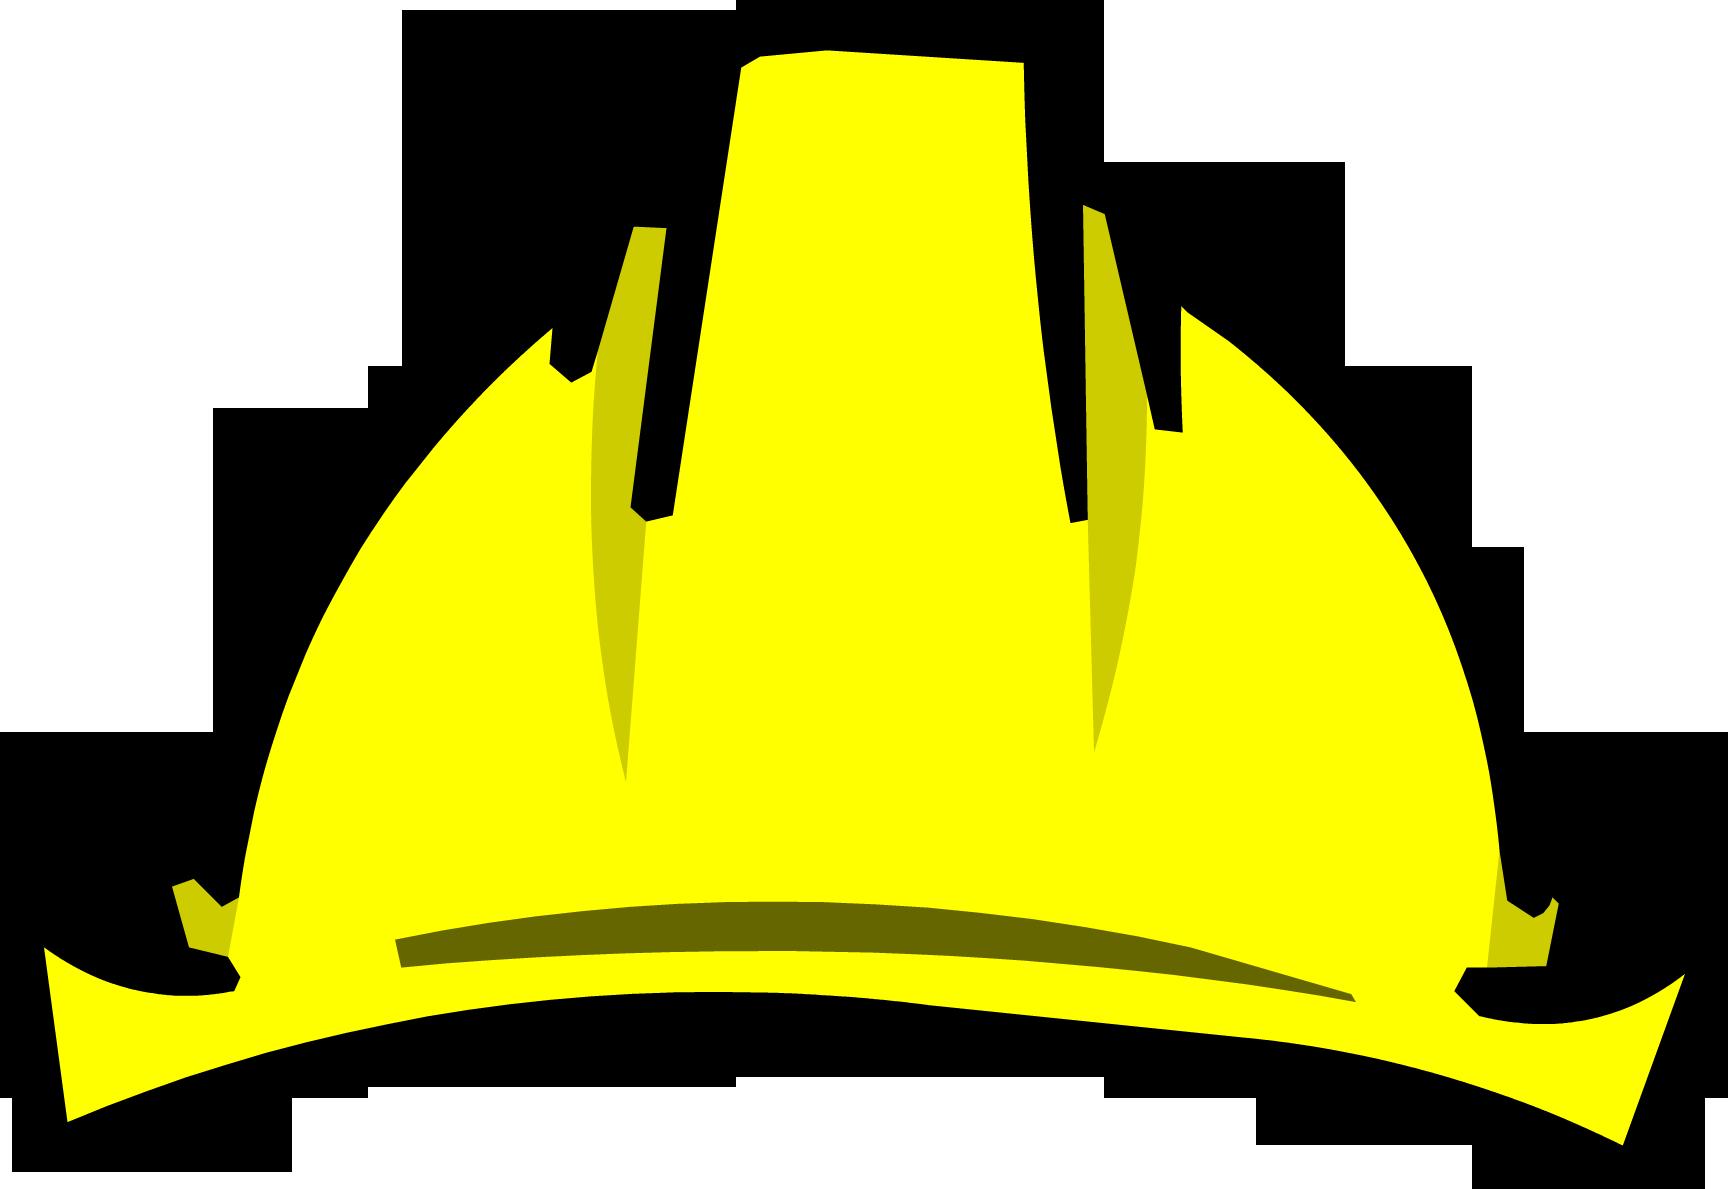 Hard Hat - Club Penguin Wiki - The free,-Hard Hat - Club Penguin Wiki - The free, editable encyclopedia-8